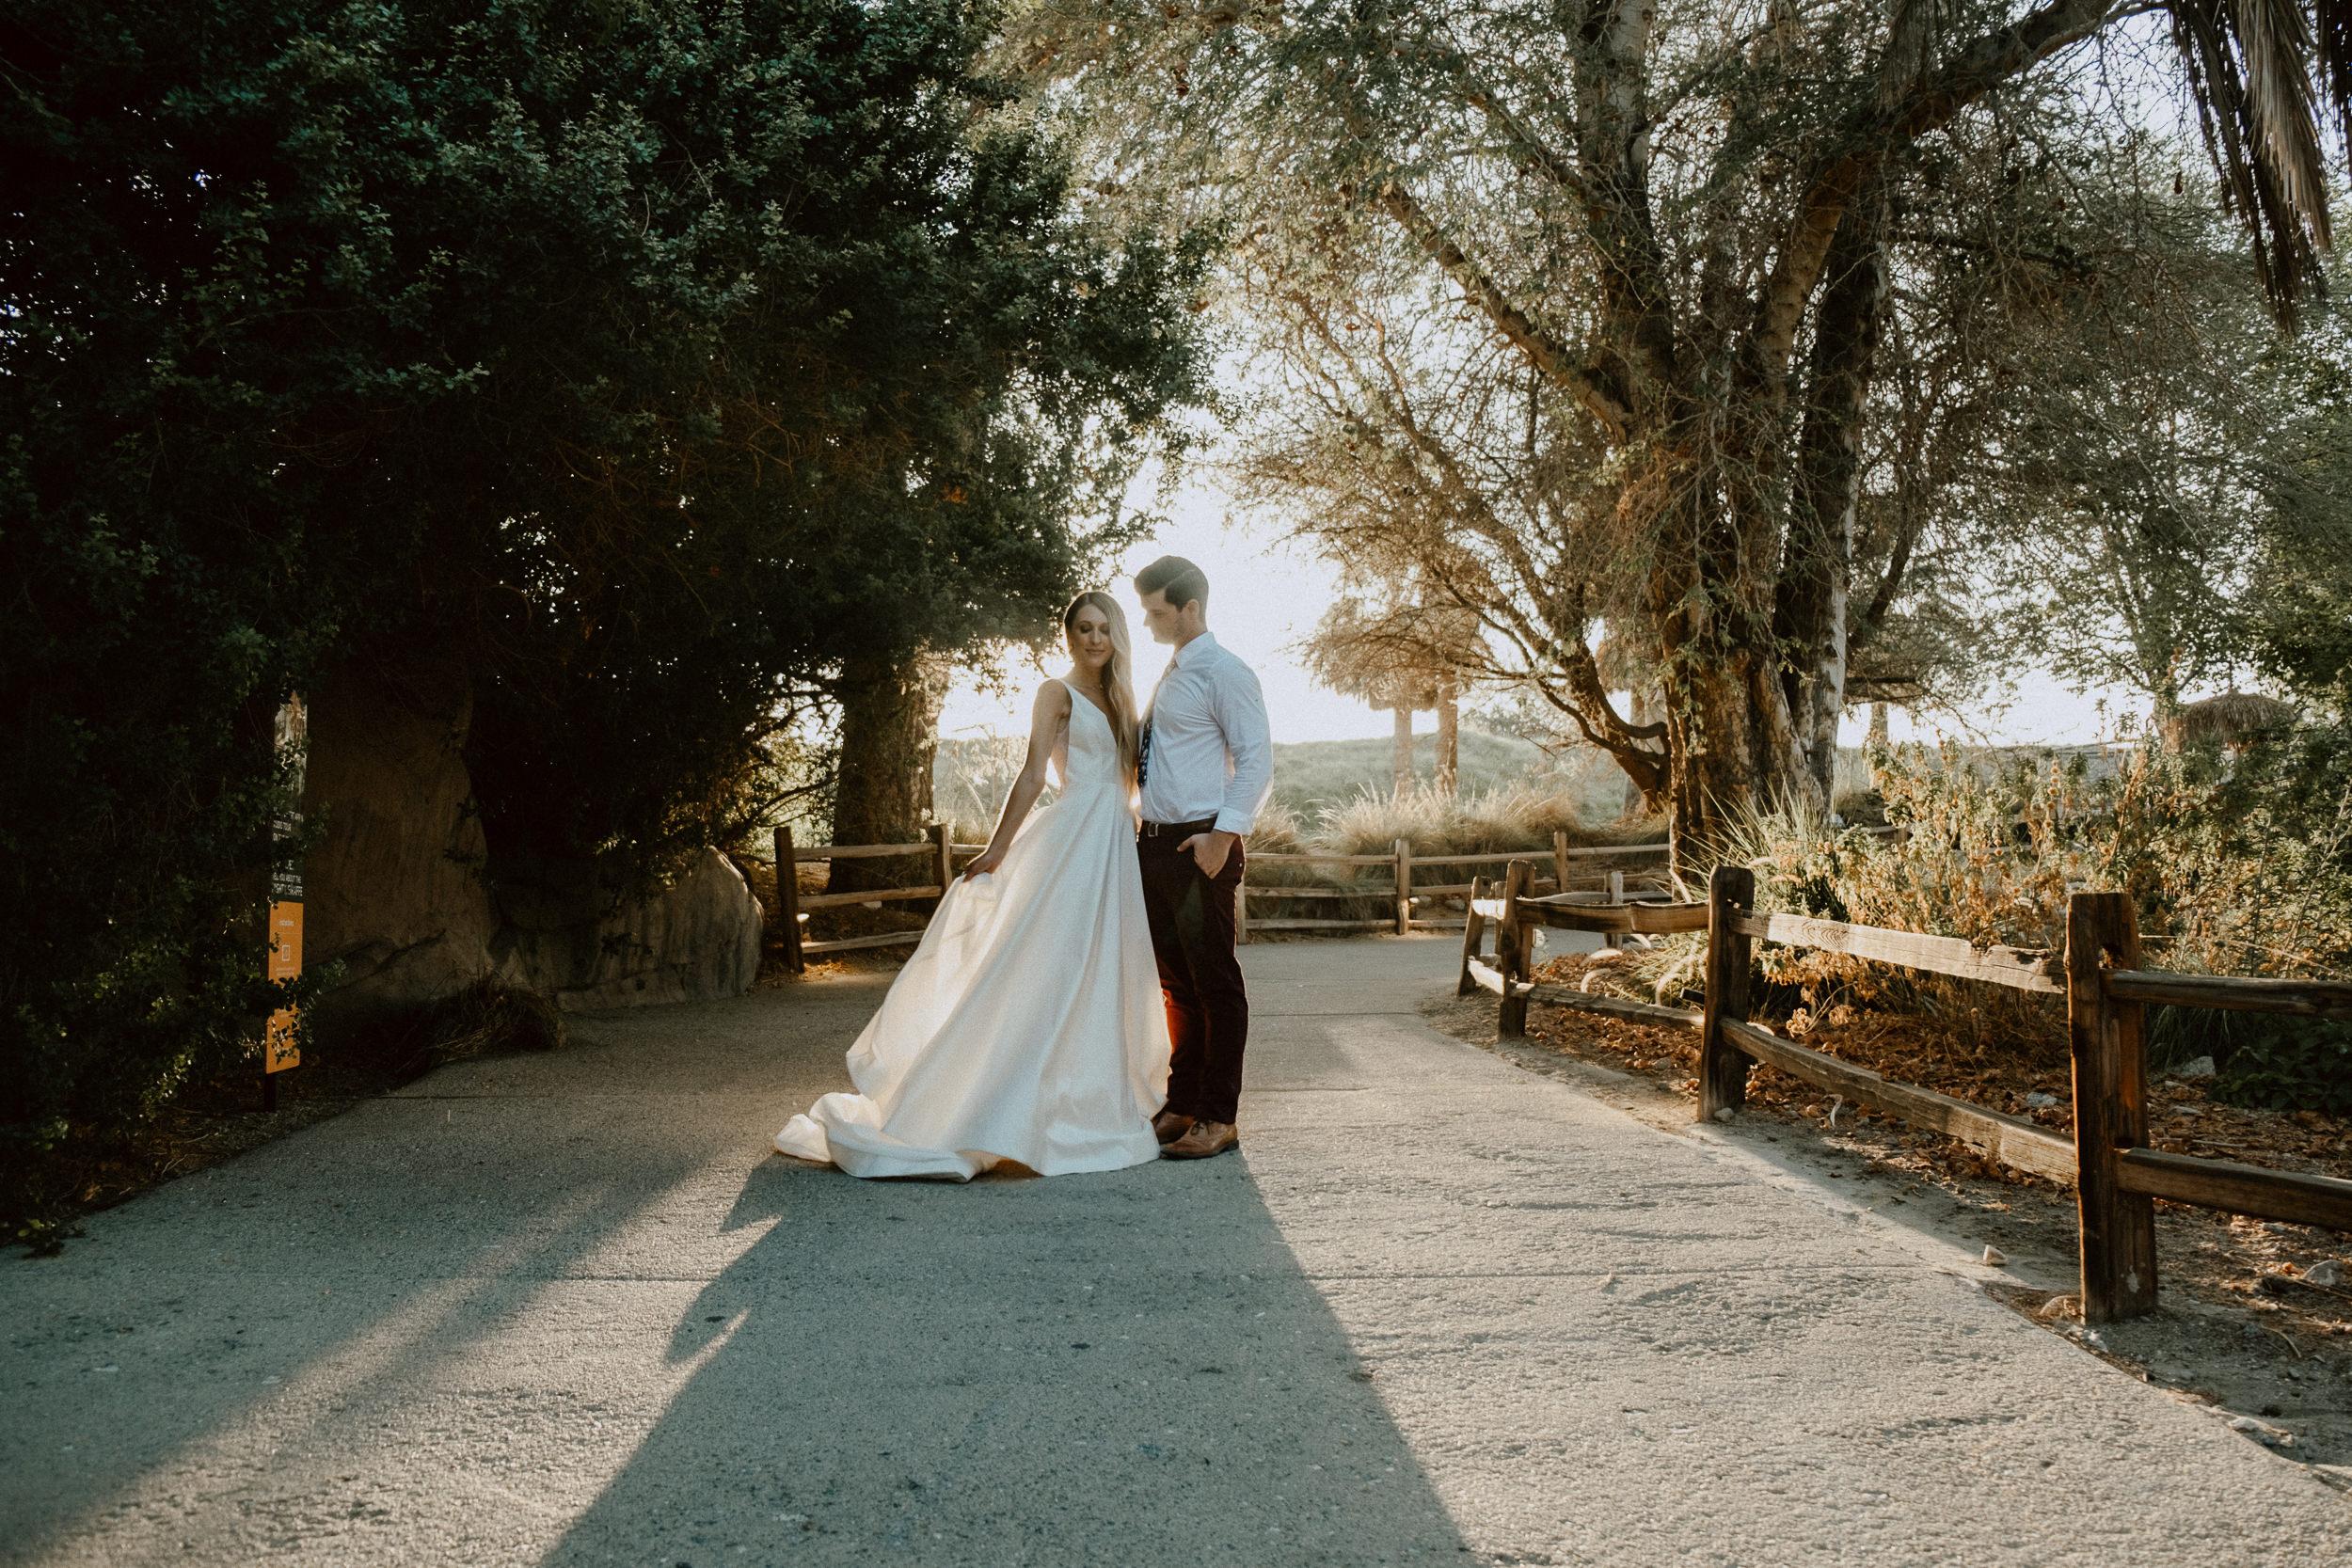 sChelsie + Chris - The Desert Shootout Wedding Romantics at The Living Desert-39.jpg